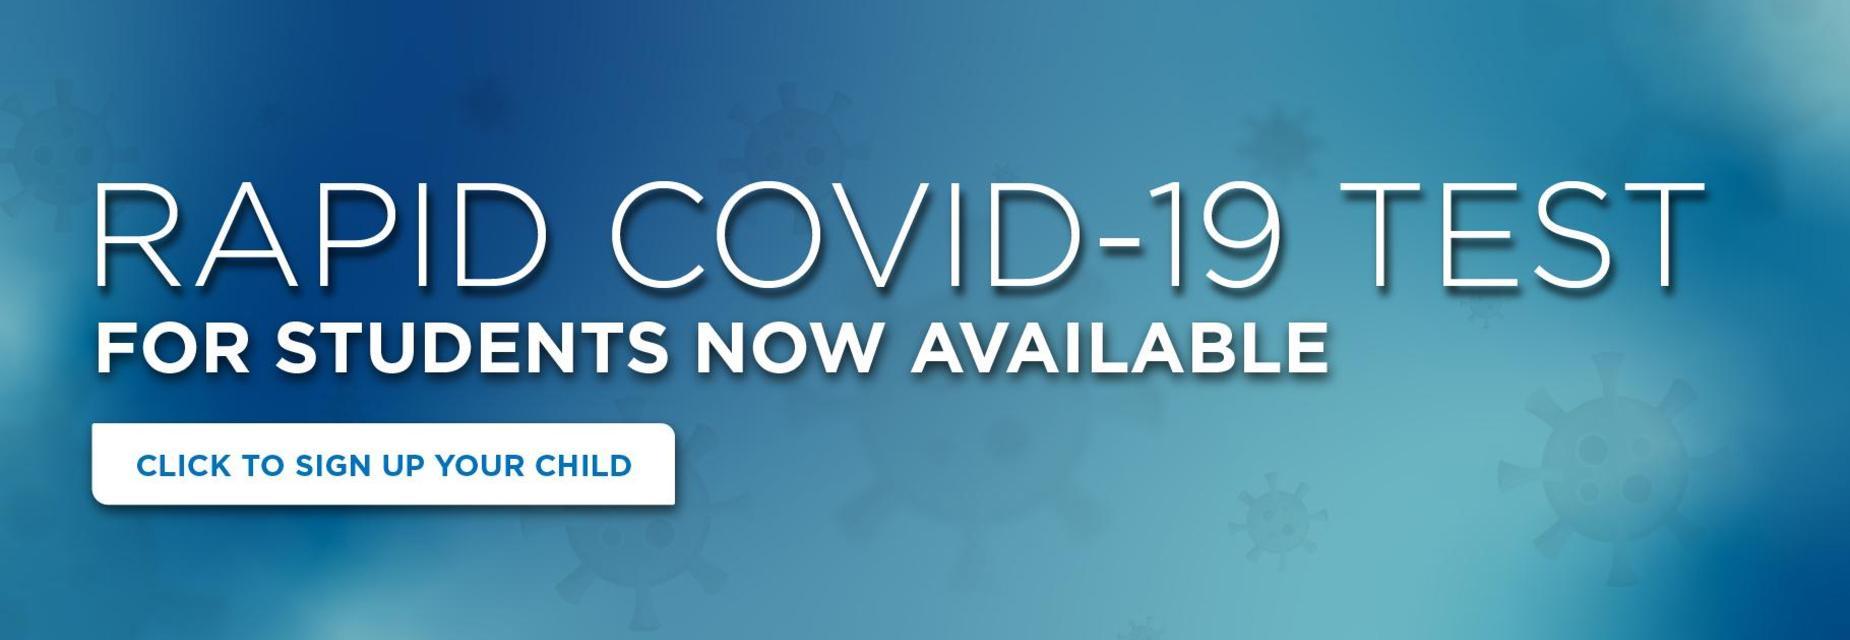 rapid COVID-19 test graphic